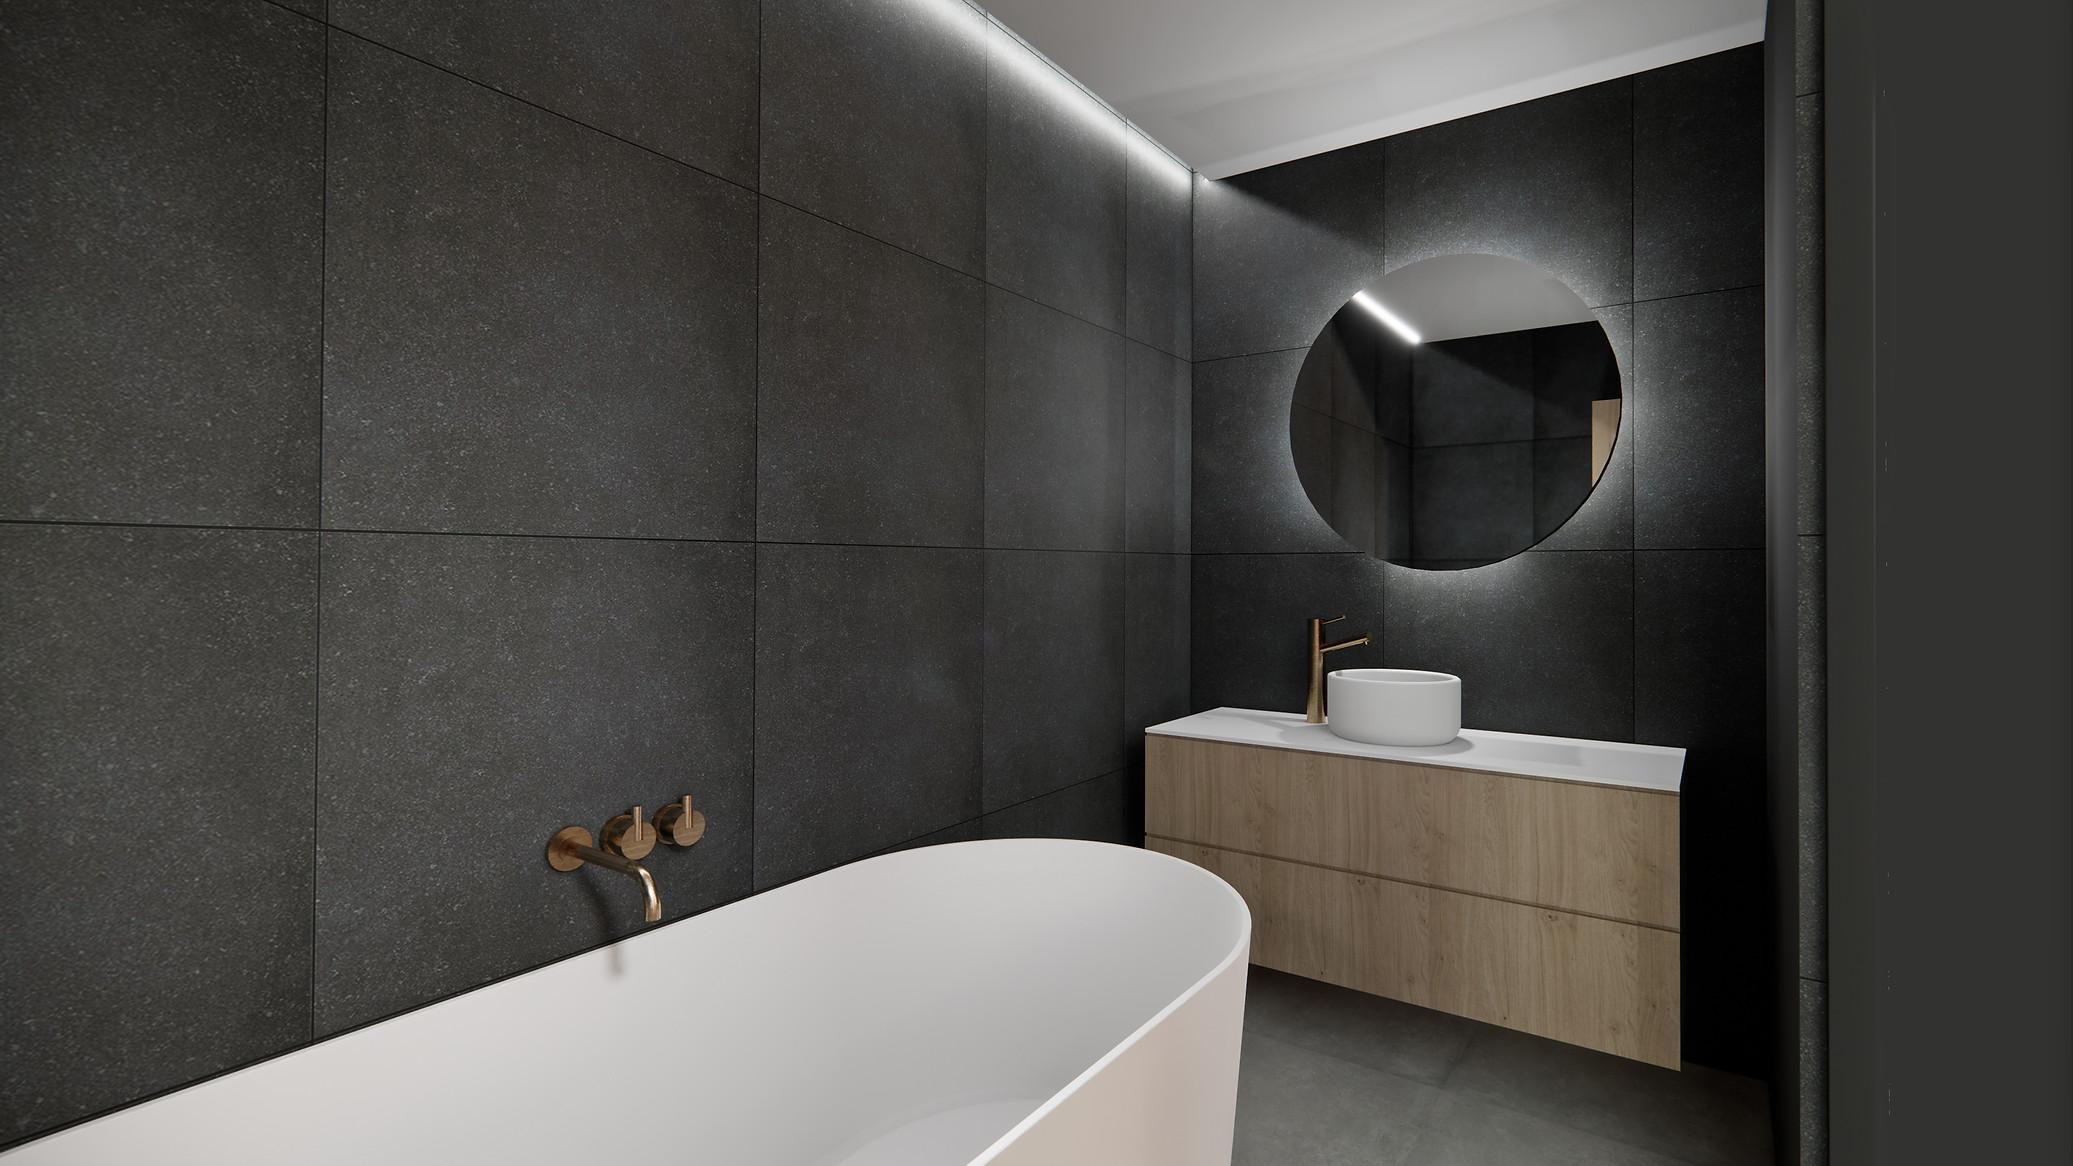 badkamerdesign.jpg